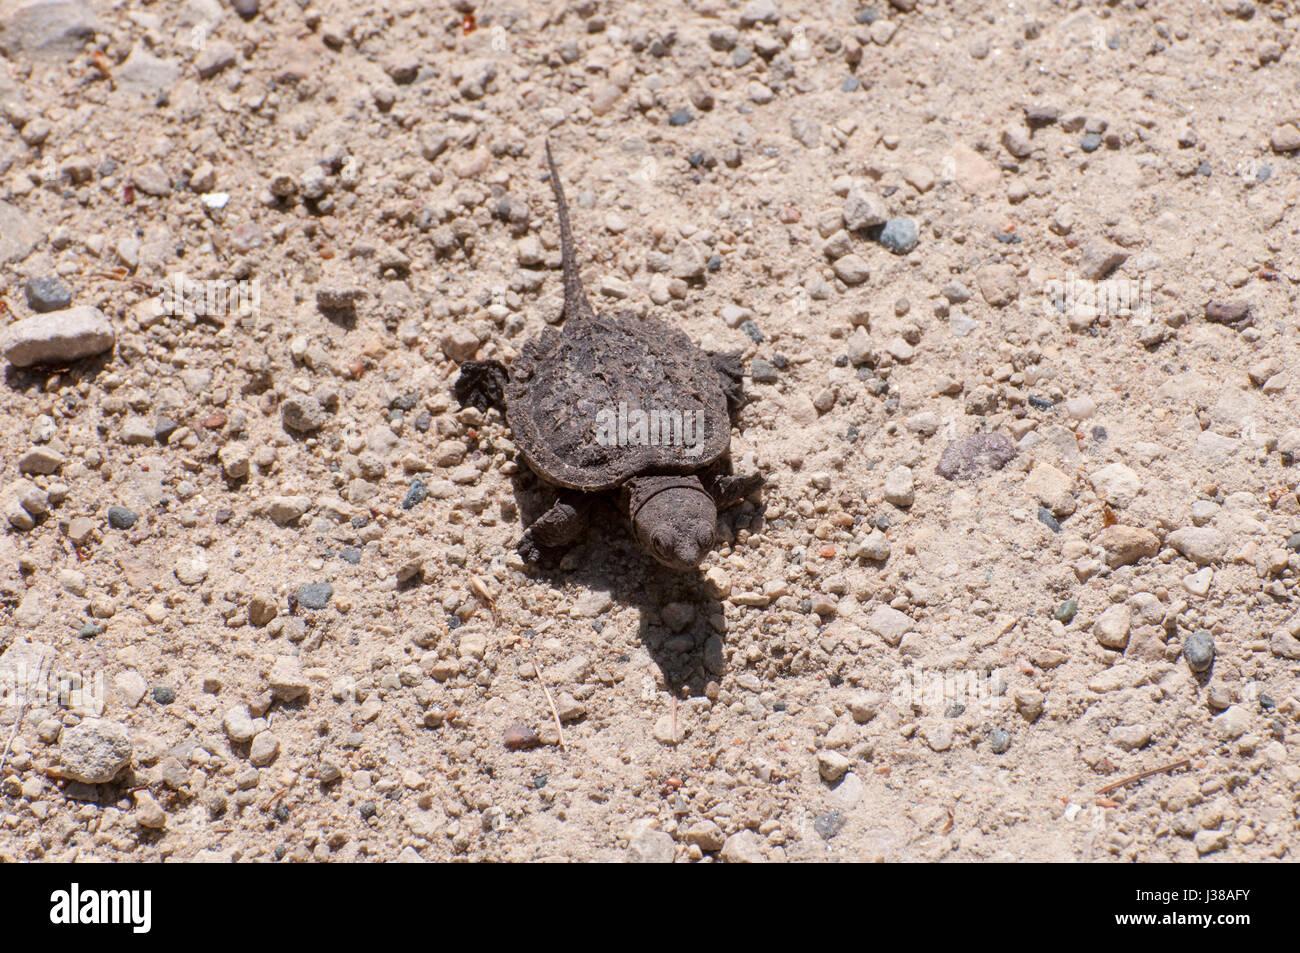 Vadnais Heights, MN. Vadnais lake regional park. Baby Snapping Turtle, Chelydra serpentina, heading to the lake. Stock Photo